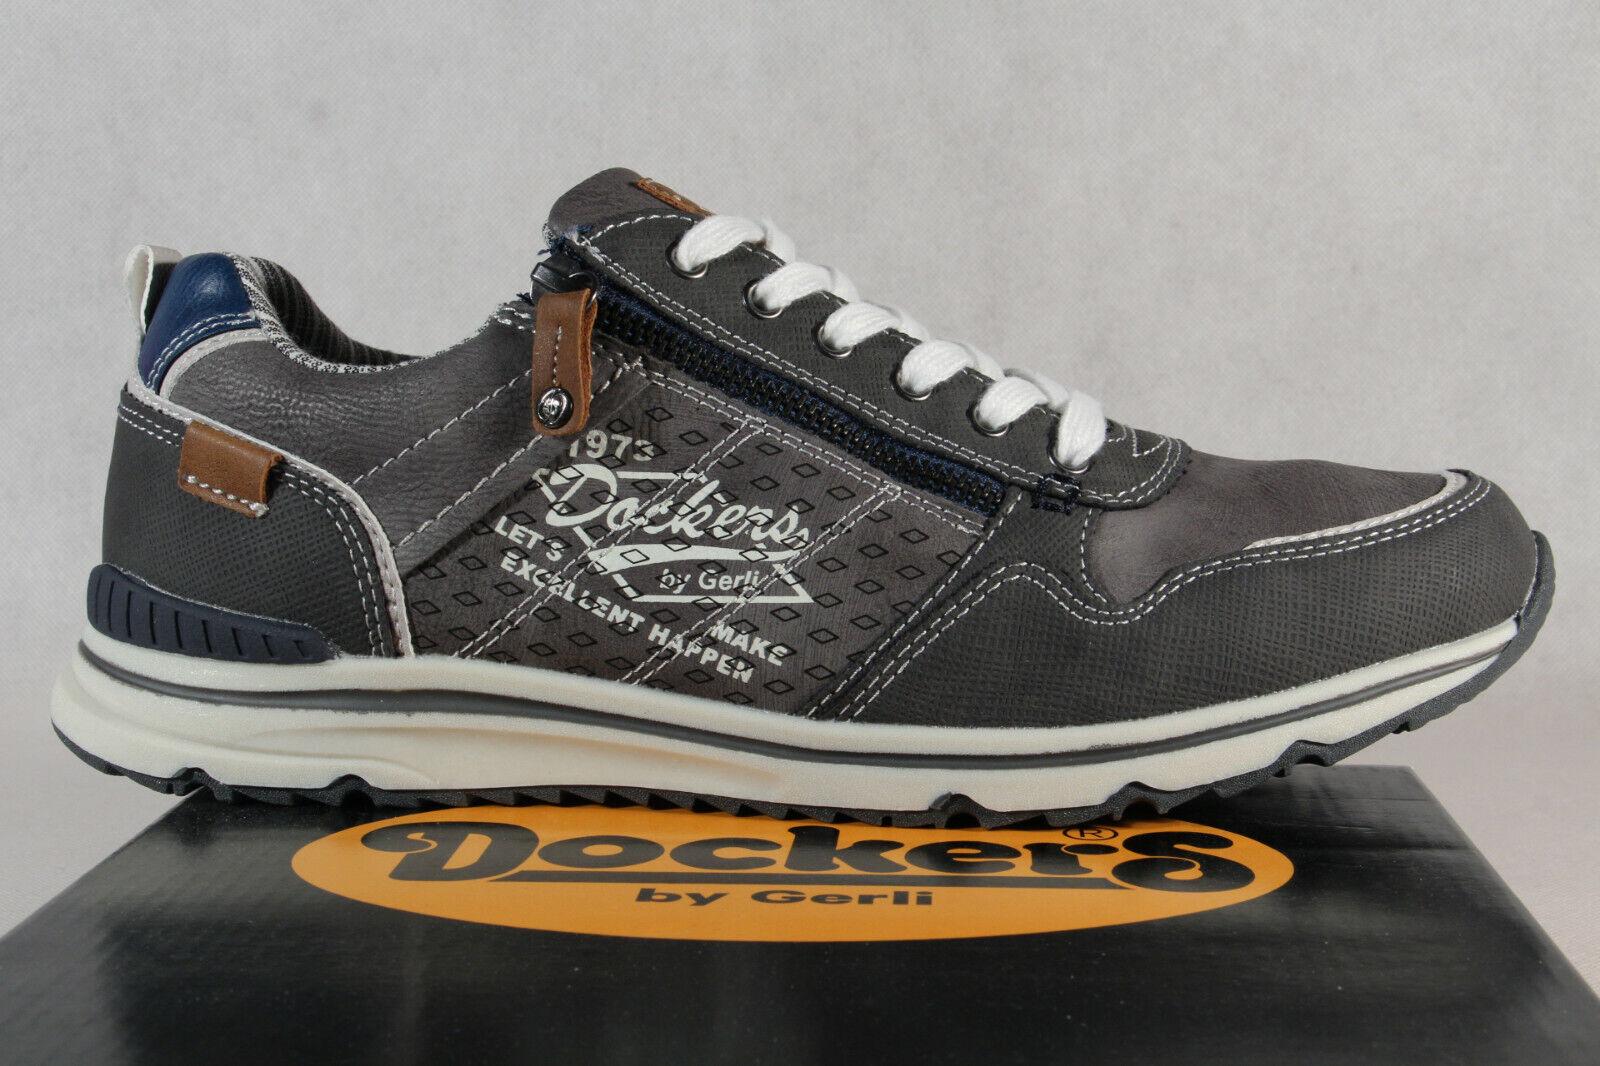 Dockers Herren Schnürschuhe Sneakers Halbschuhe grau 42MO003